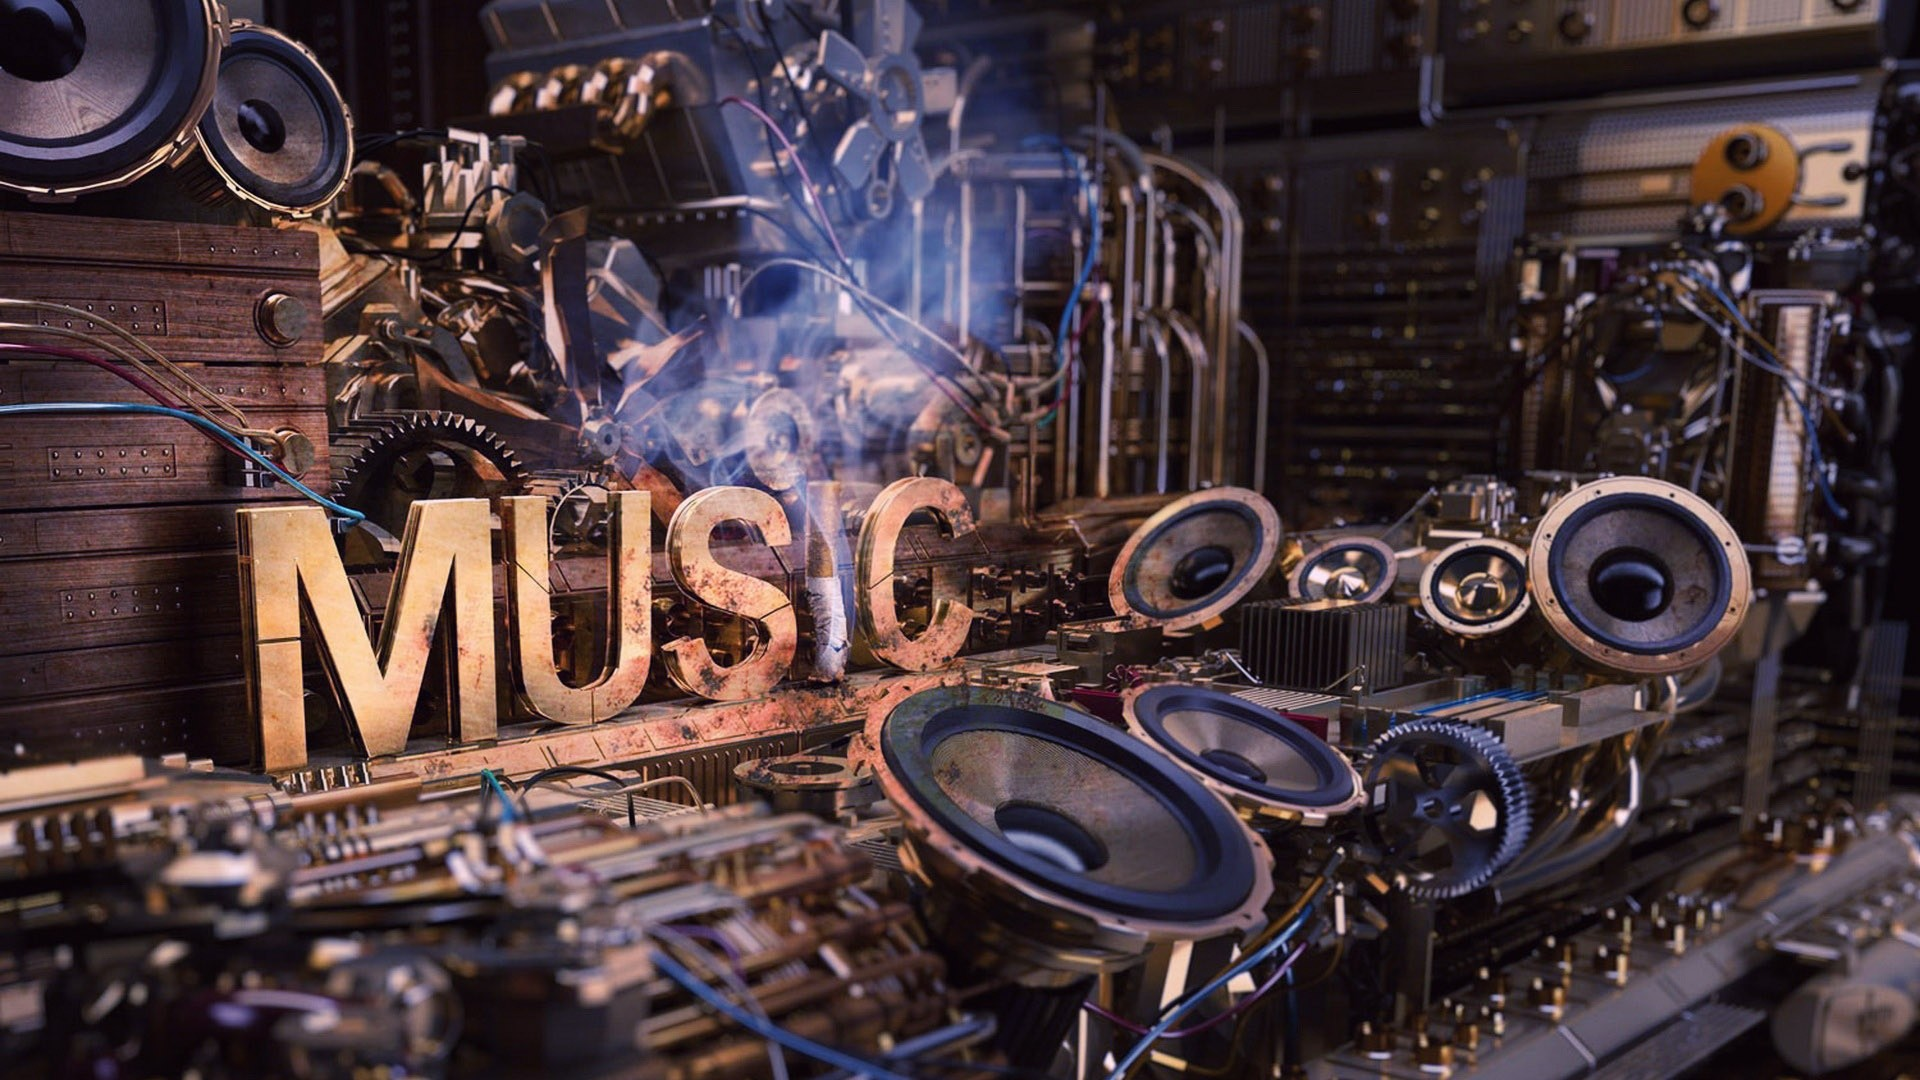 Музыка из заставки дом 2 3